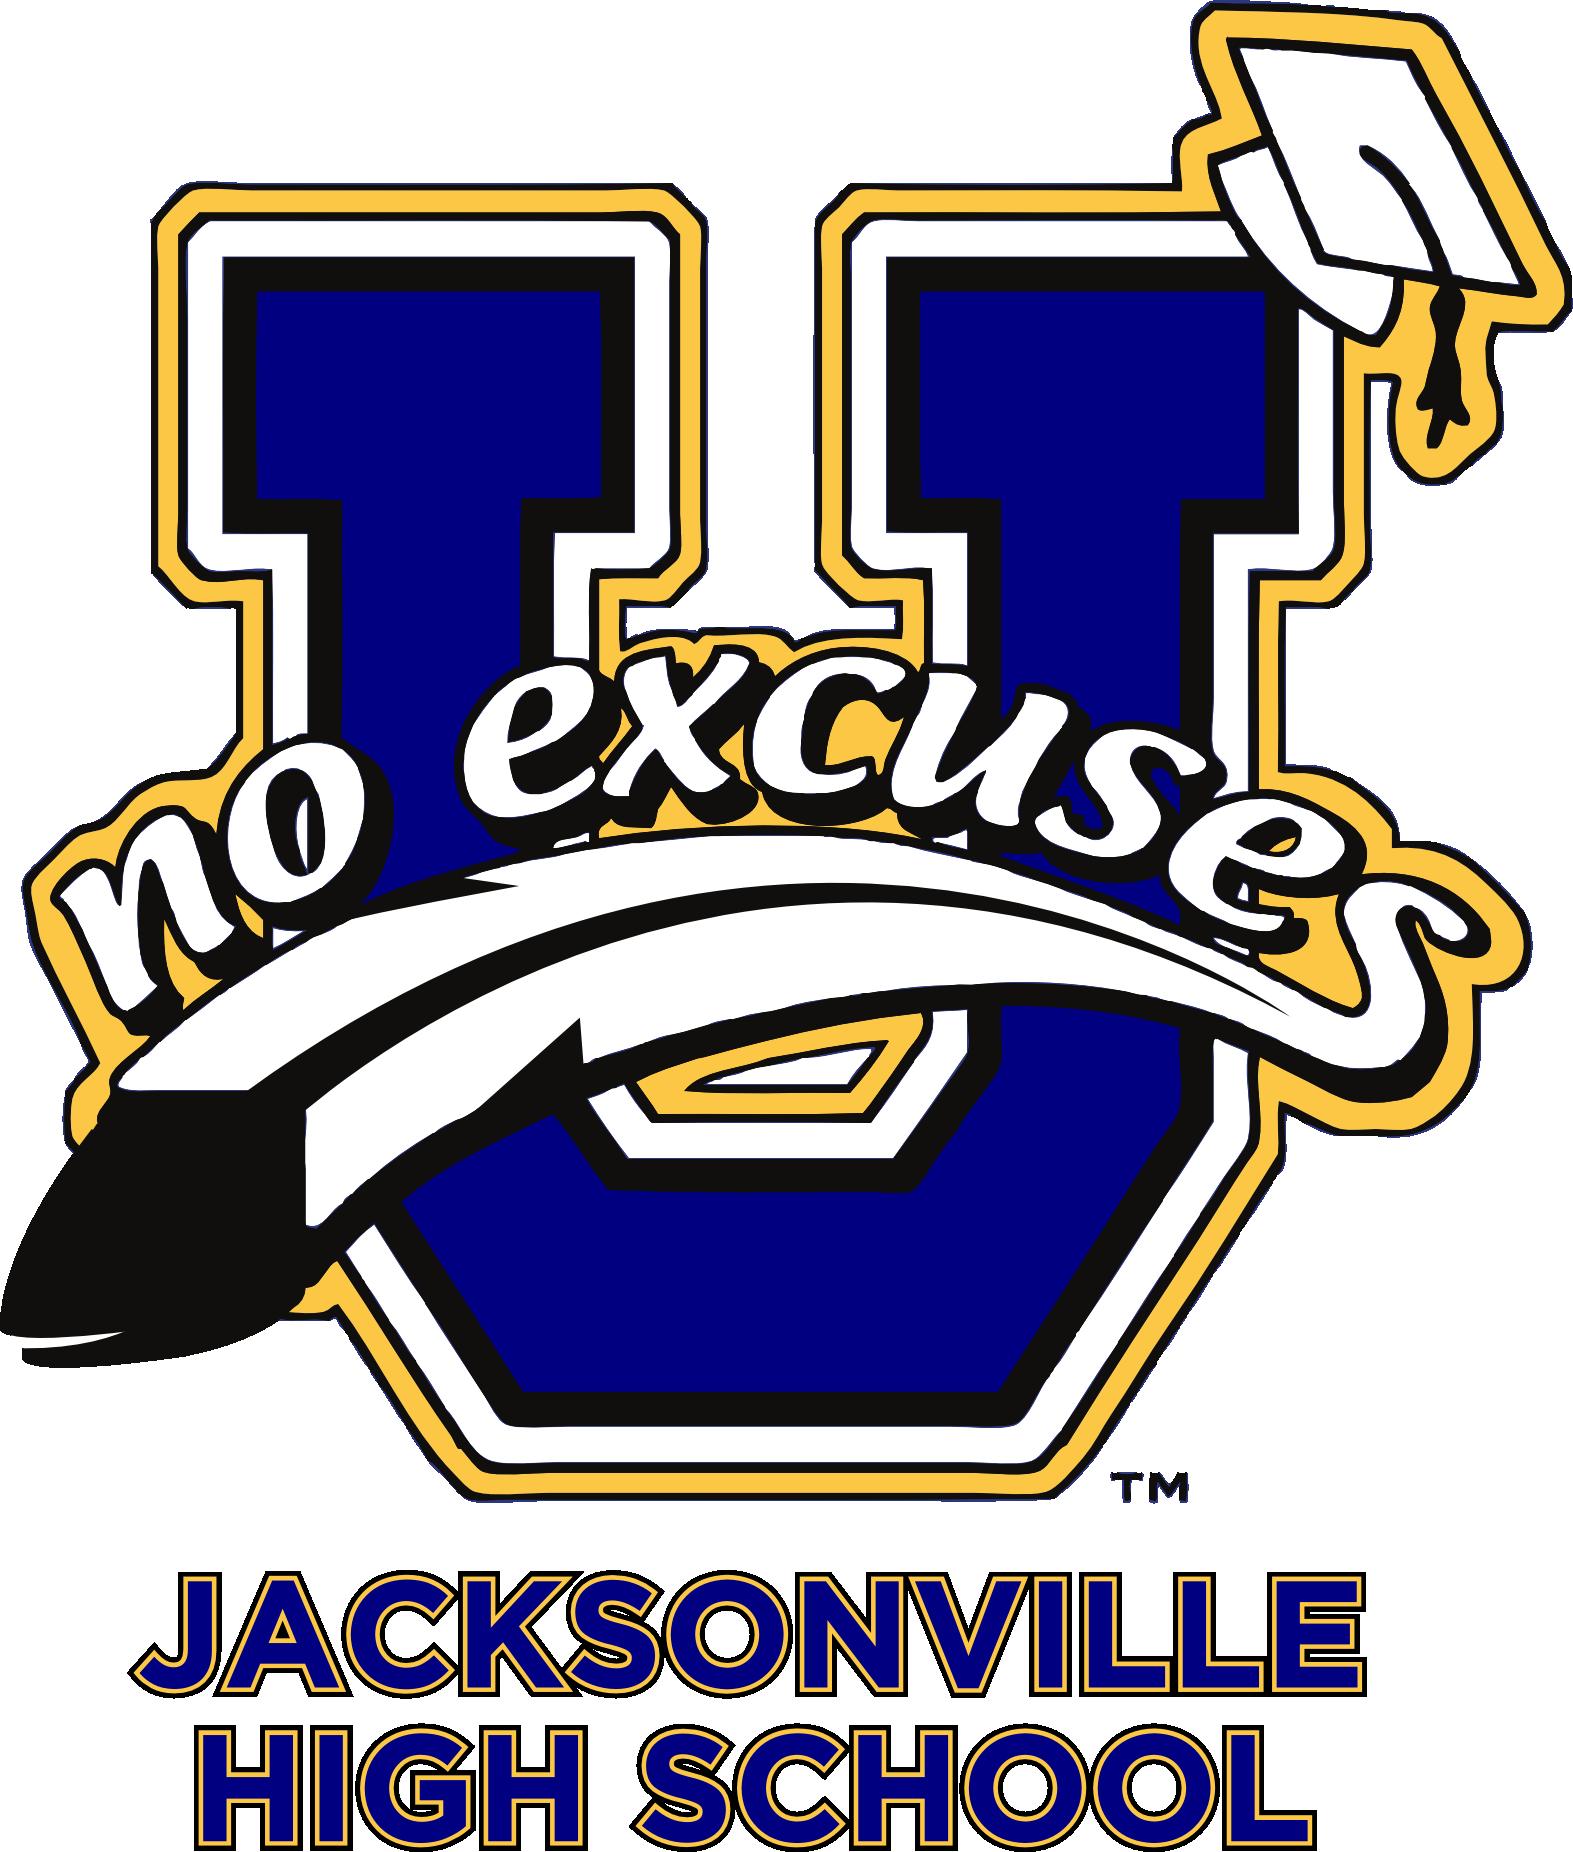 Jacksonville High School NEU logo